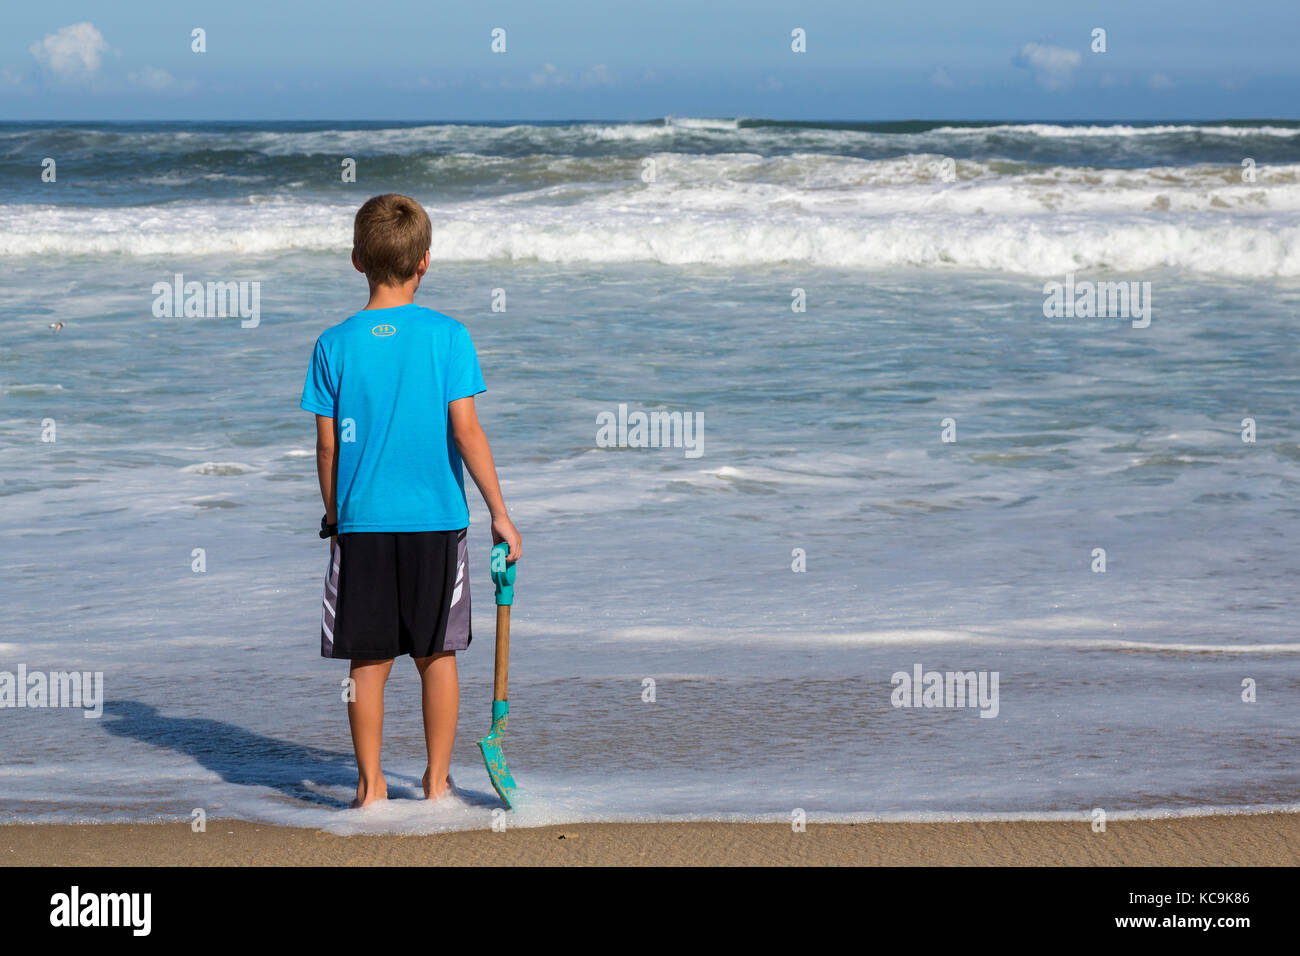 Avon, Outer Banks, North Carolina, USA.  Young Boy Contemplating the Atlantic Waves. - Stock Image